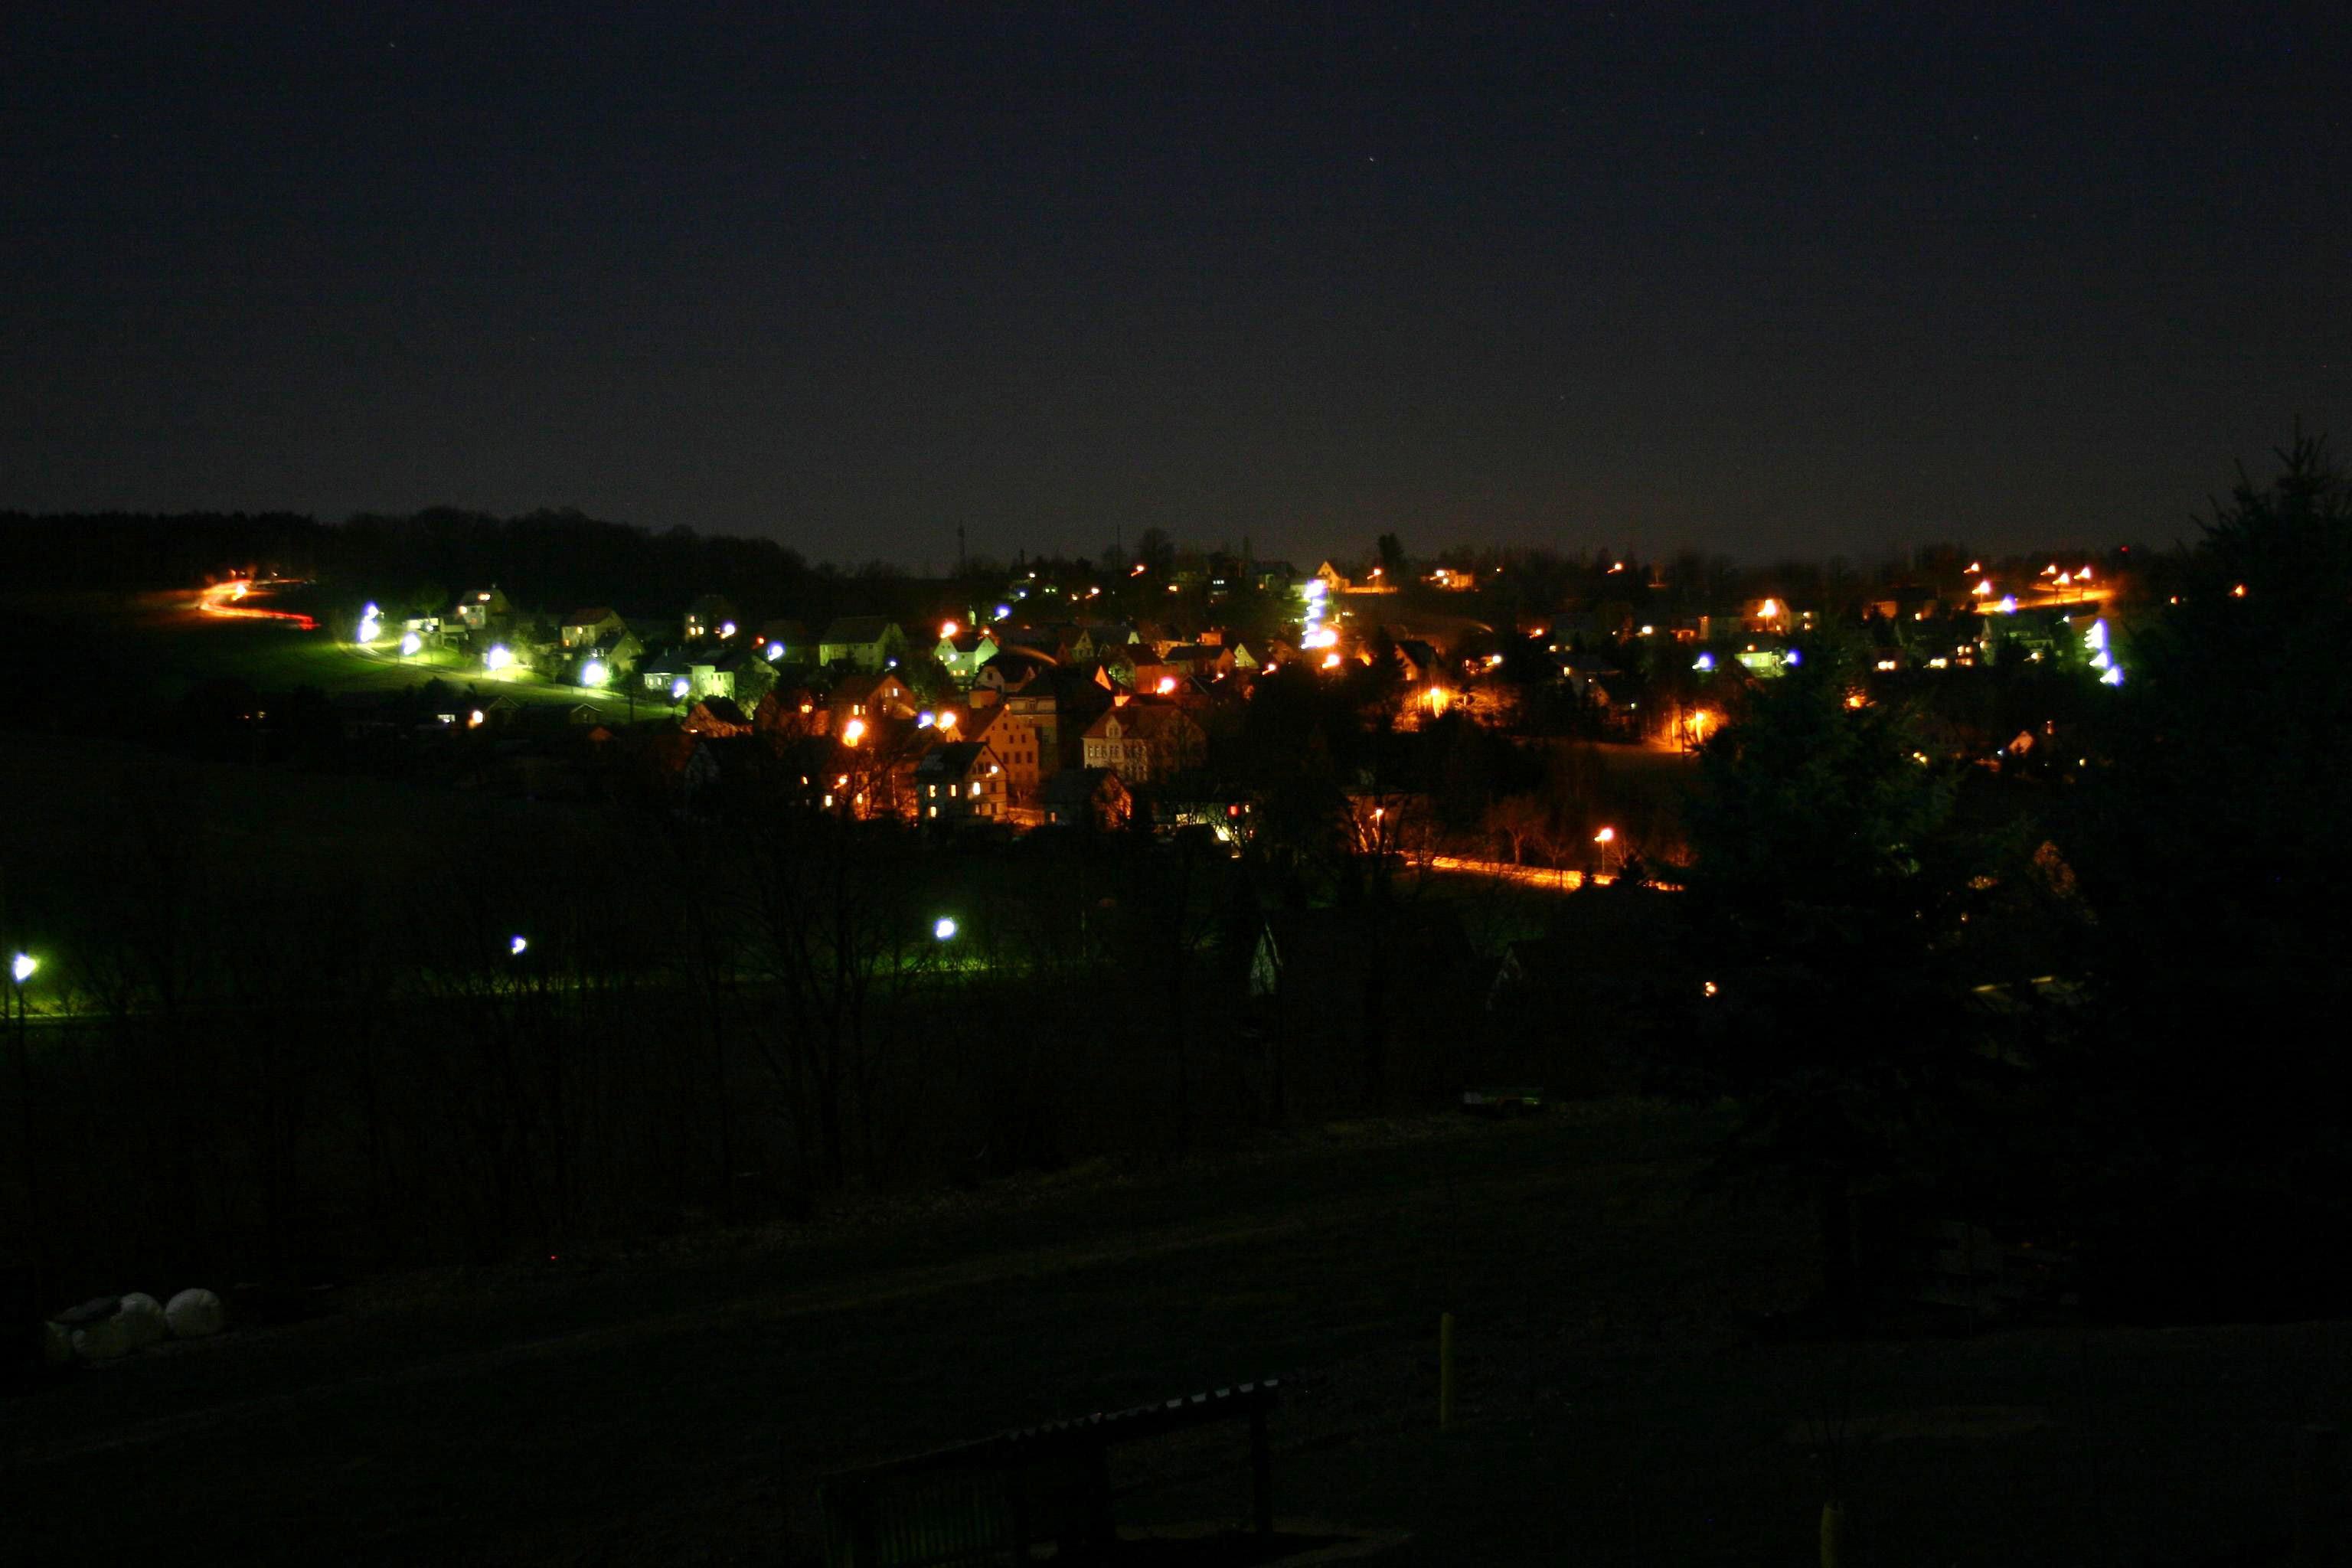 4.) Göritzhain Blick v Wiederberg  02.08  05.00 Uhr